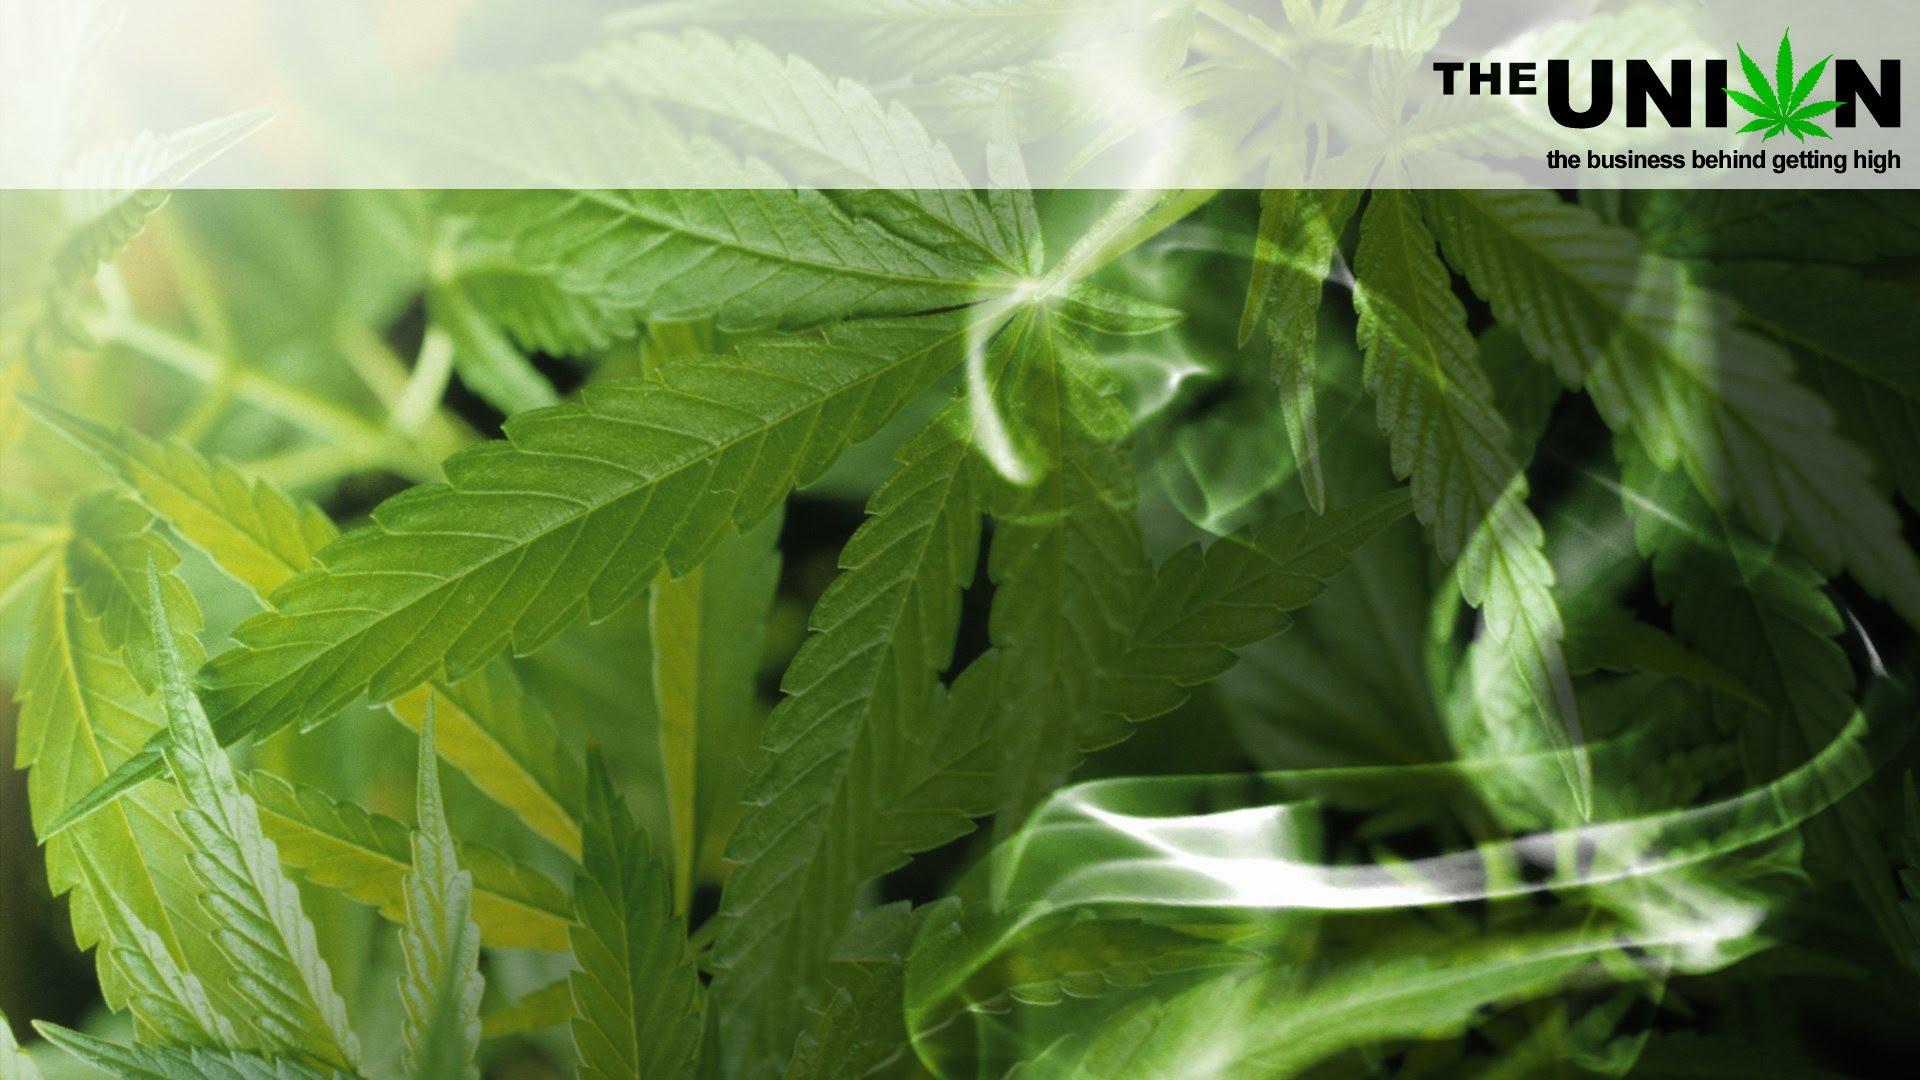 La historia de la Marihuana en The Union, un gran documental